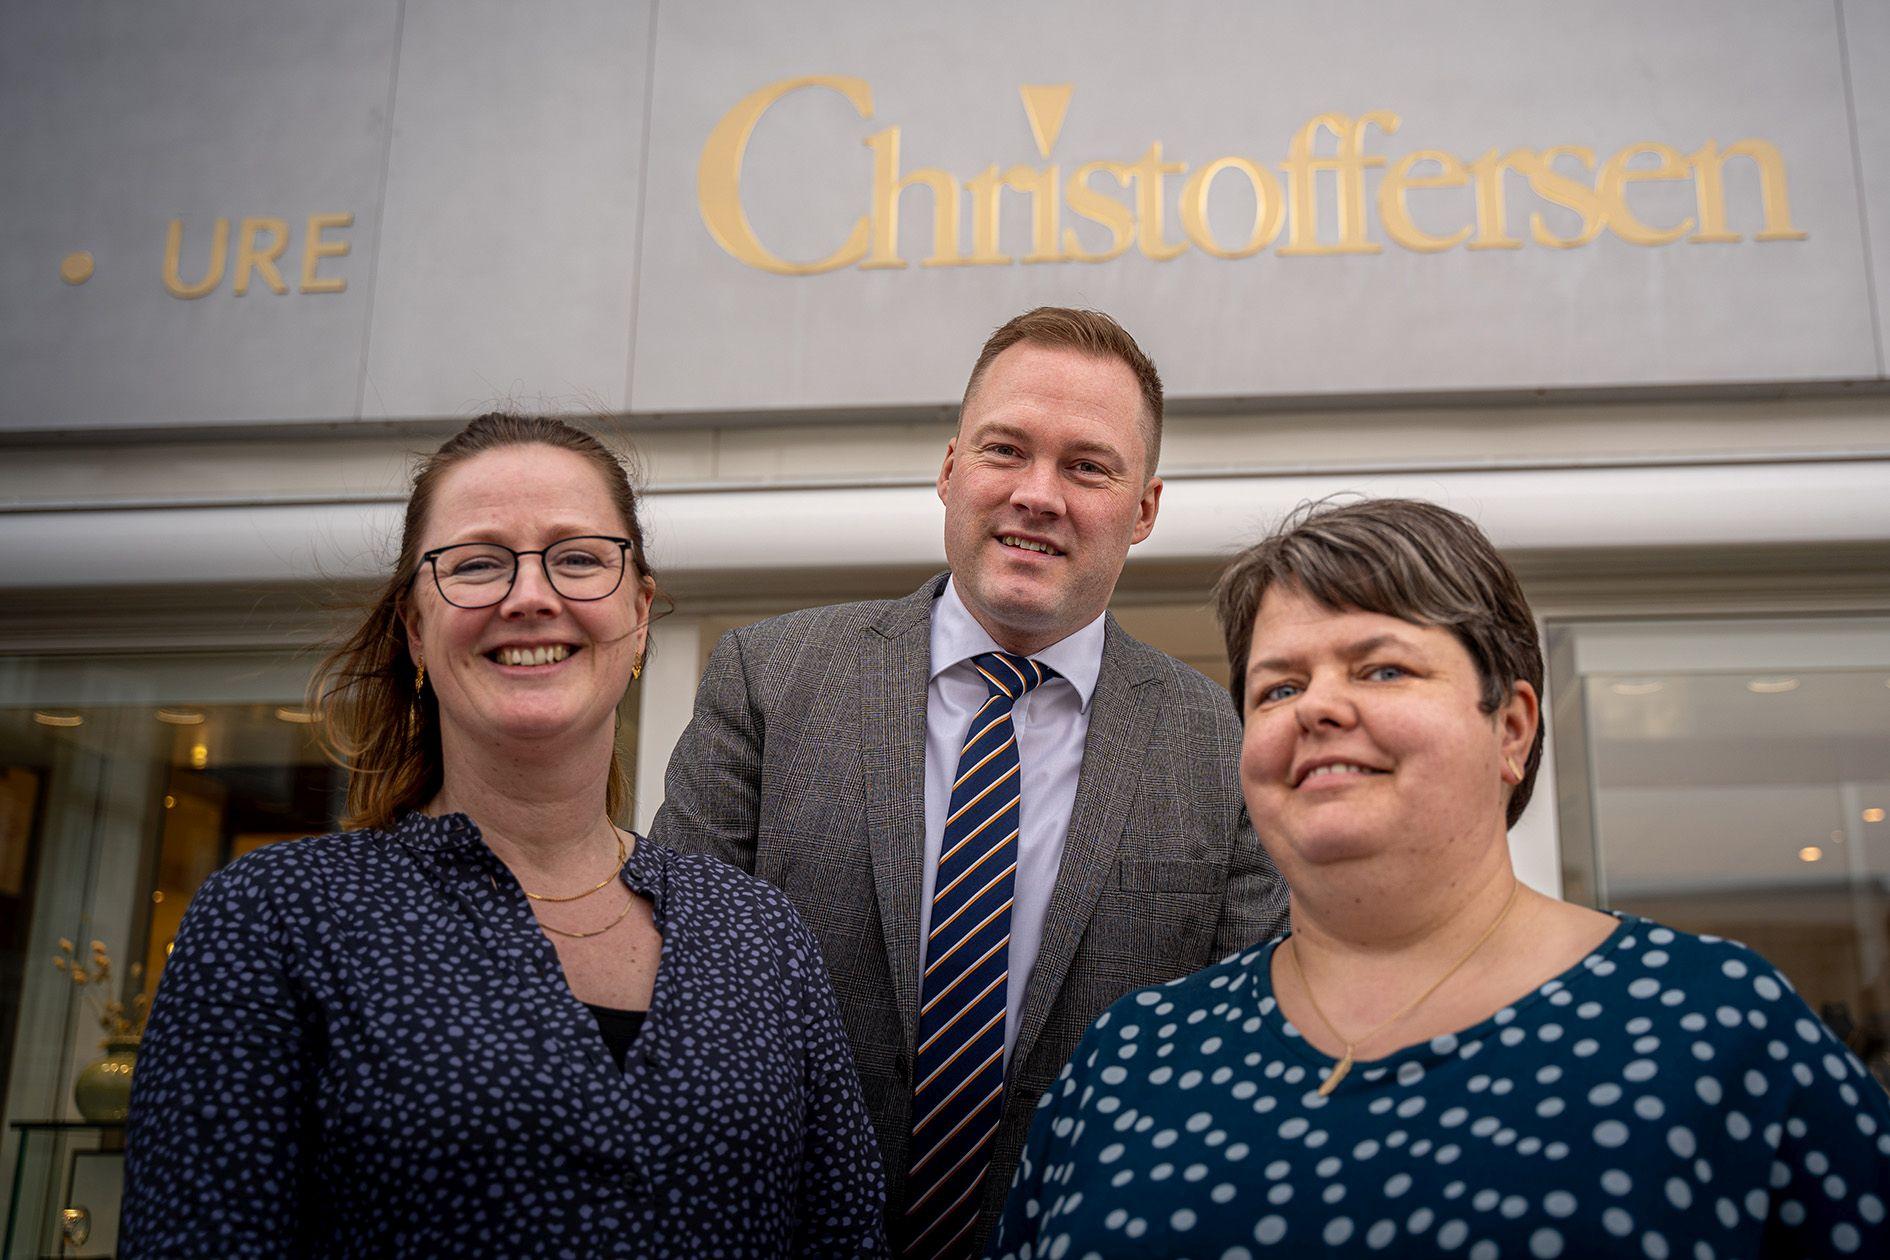 BEDSTE KVINDESHOPPING CHRISTOFFERSEN